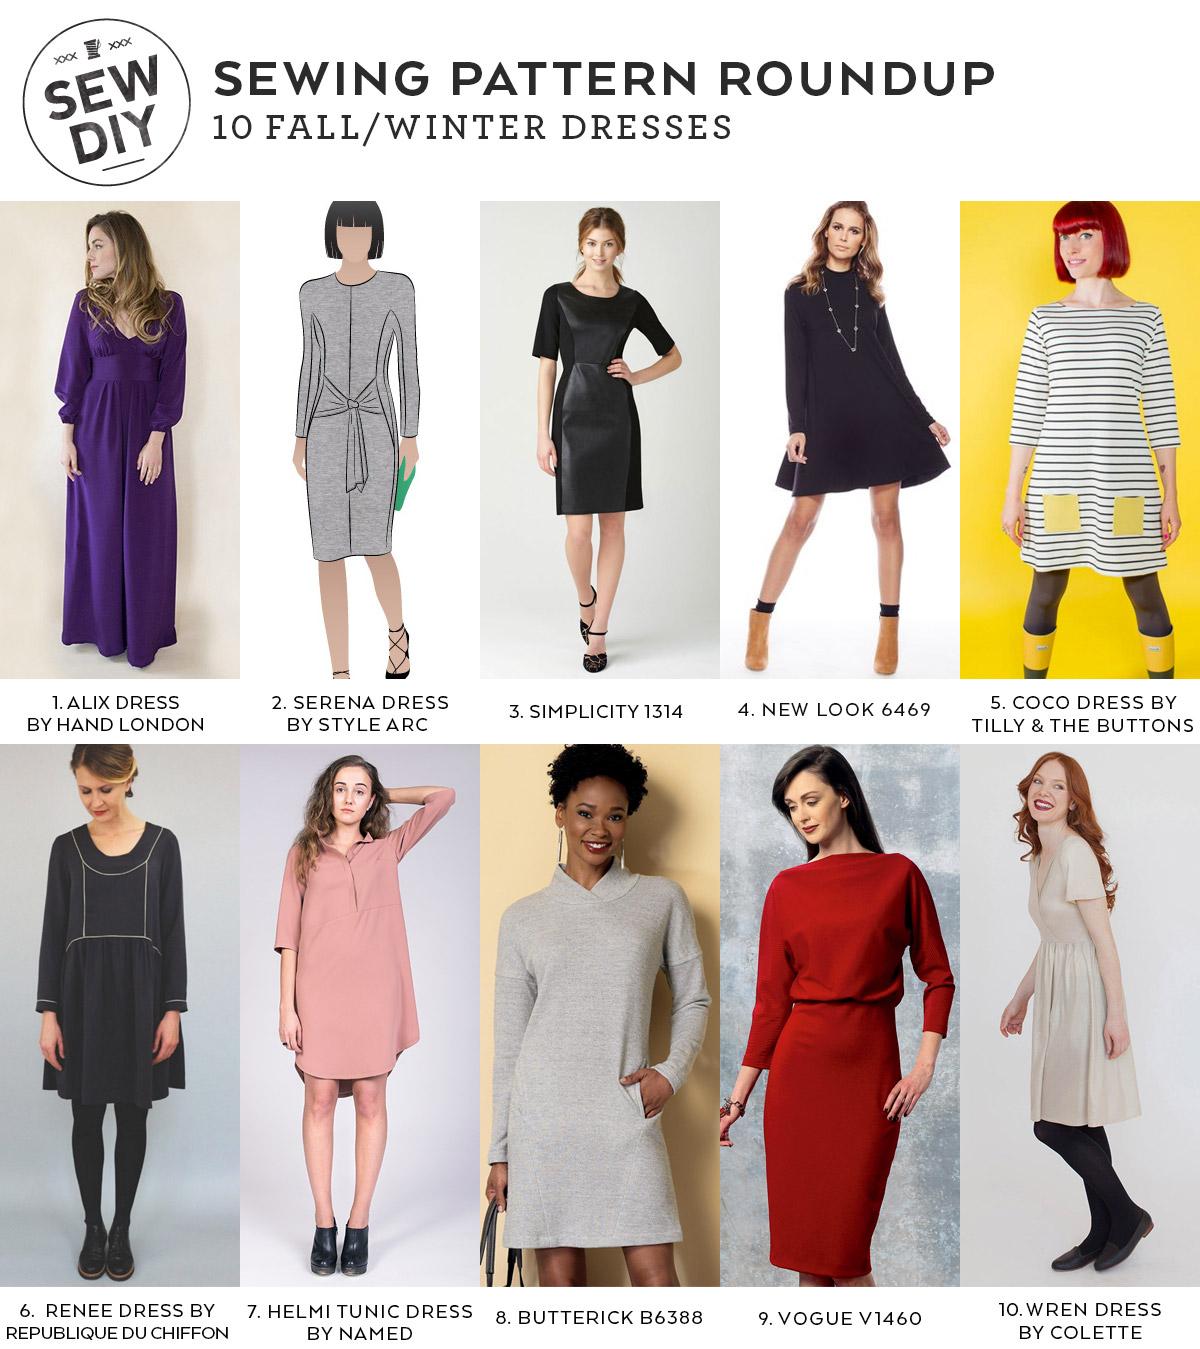 10 Fall Dress Sewing Patterns | Sew DIY